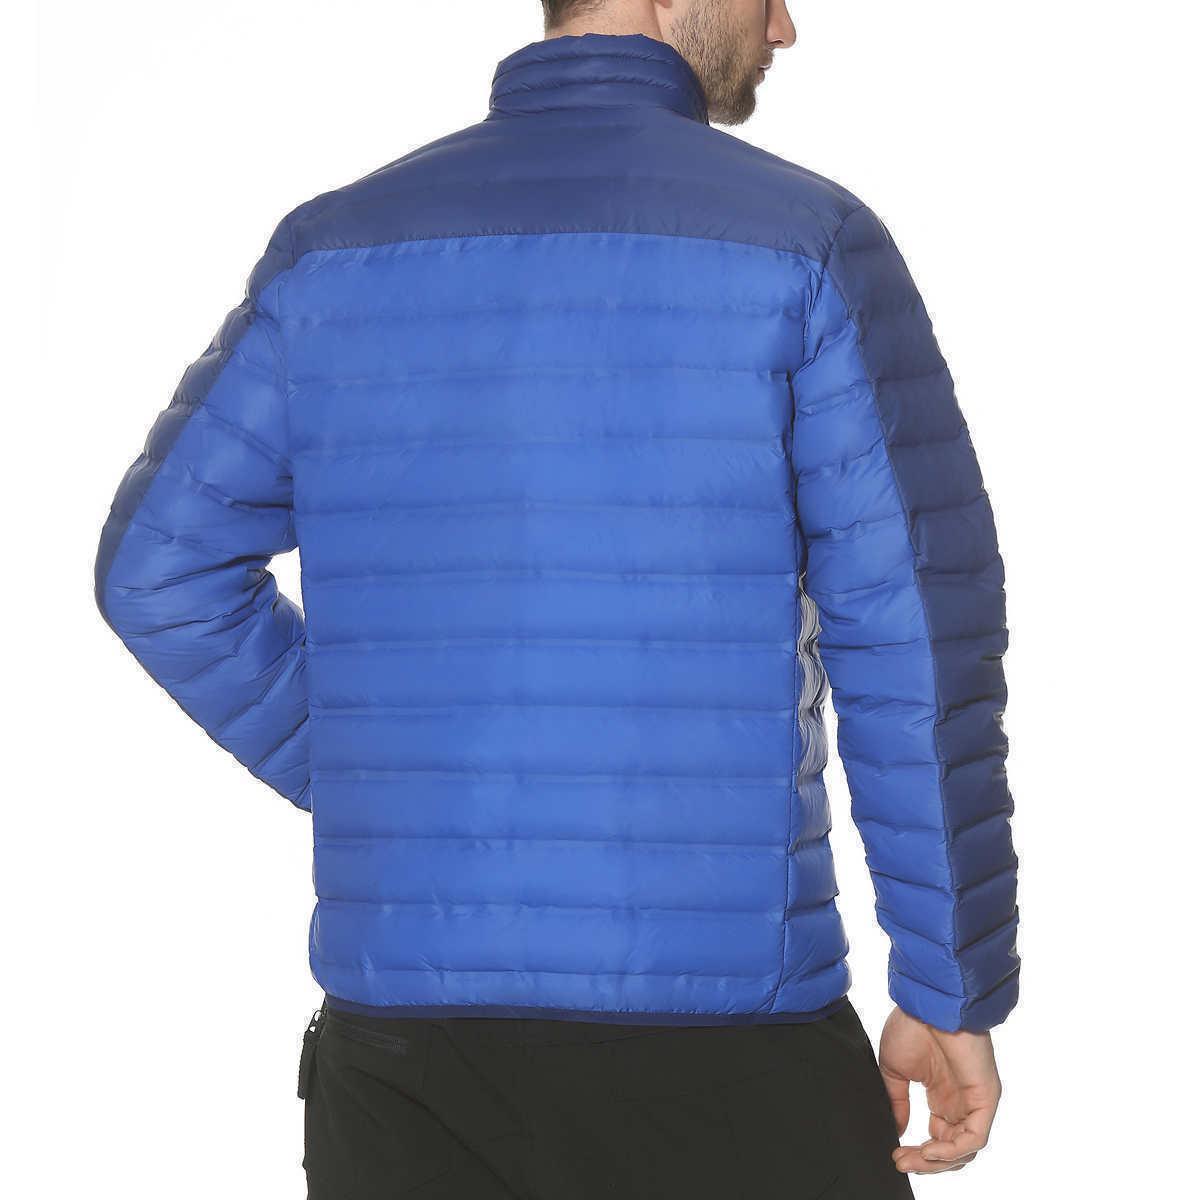 Gerry Down Jacket Color: Cobalt